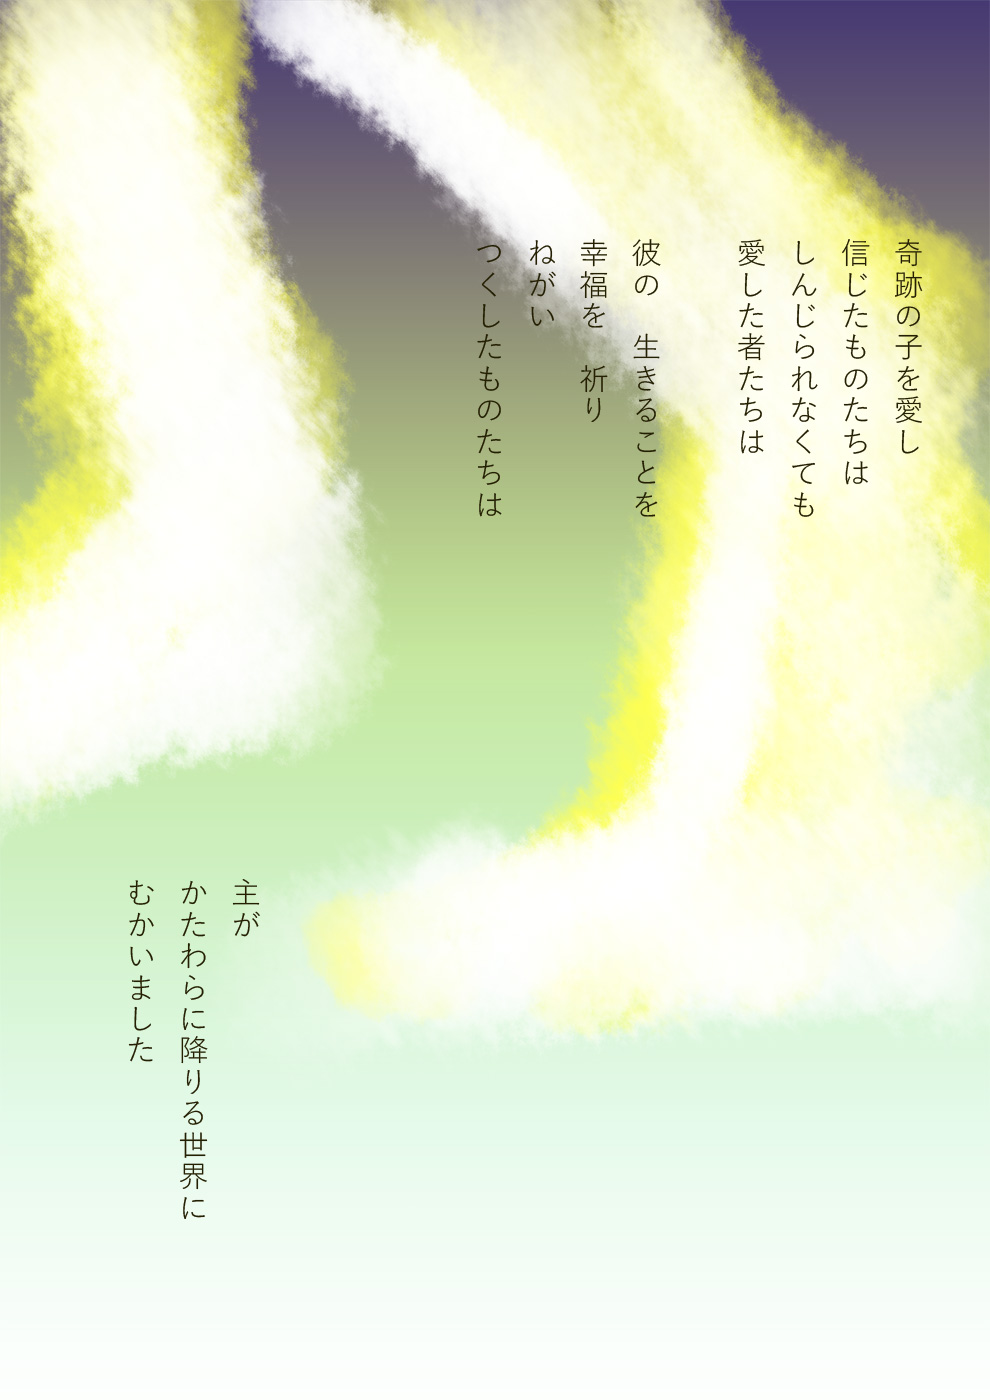 http://ahito.com/comic/ehon/kamiuta/img/2018/20180319/03.jpg